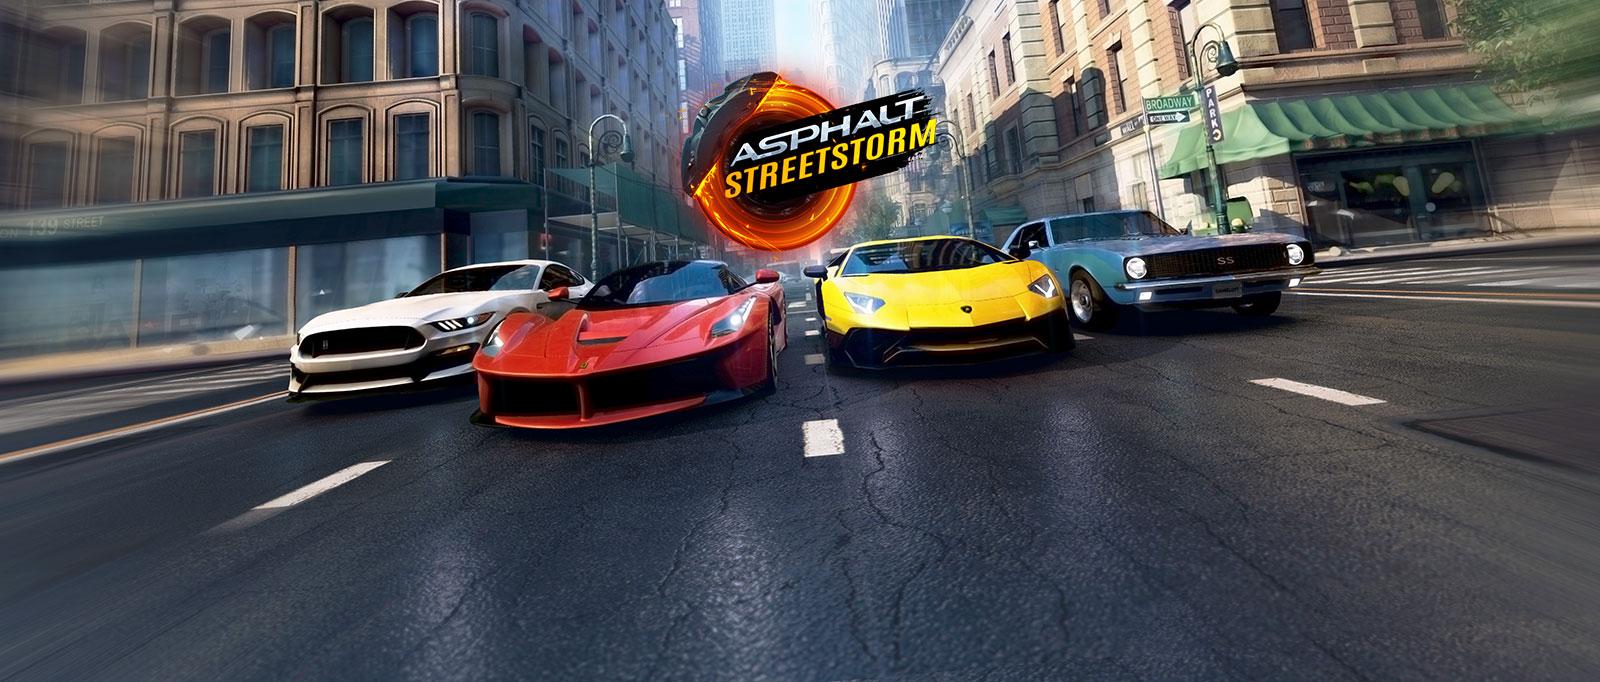 Game Balapan Asphalt Street Storm Racing